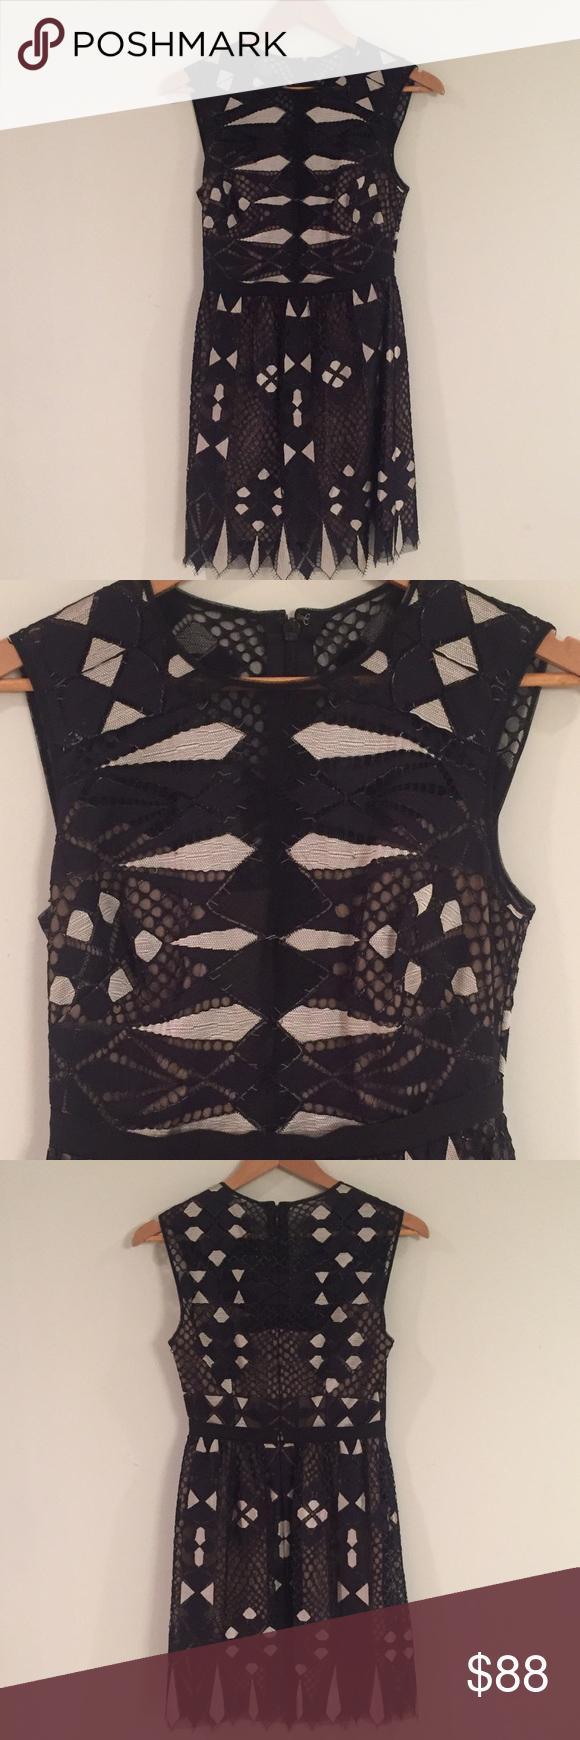 BCBG Dress BCBG Dress black and cream sheer detail with beige lining. Deep sheer V on bodice. BCBGMaxAzria Dresses Midi